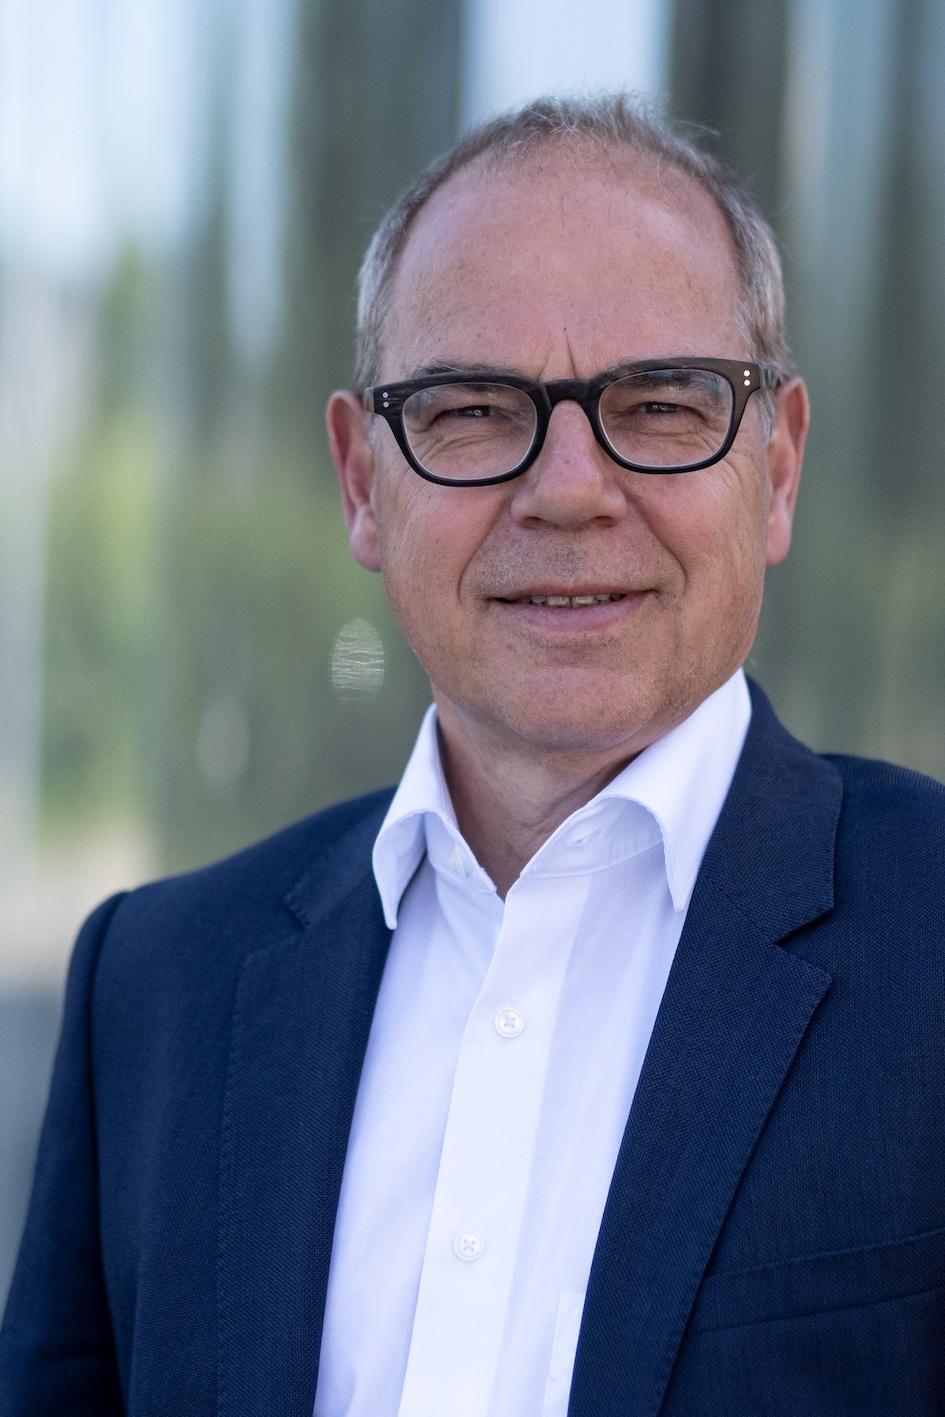 Dr. Uwe Nickel, Proventis Partners